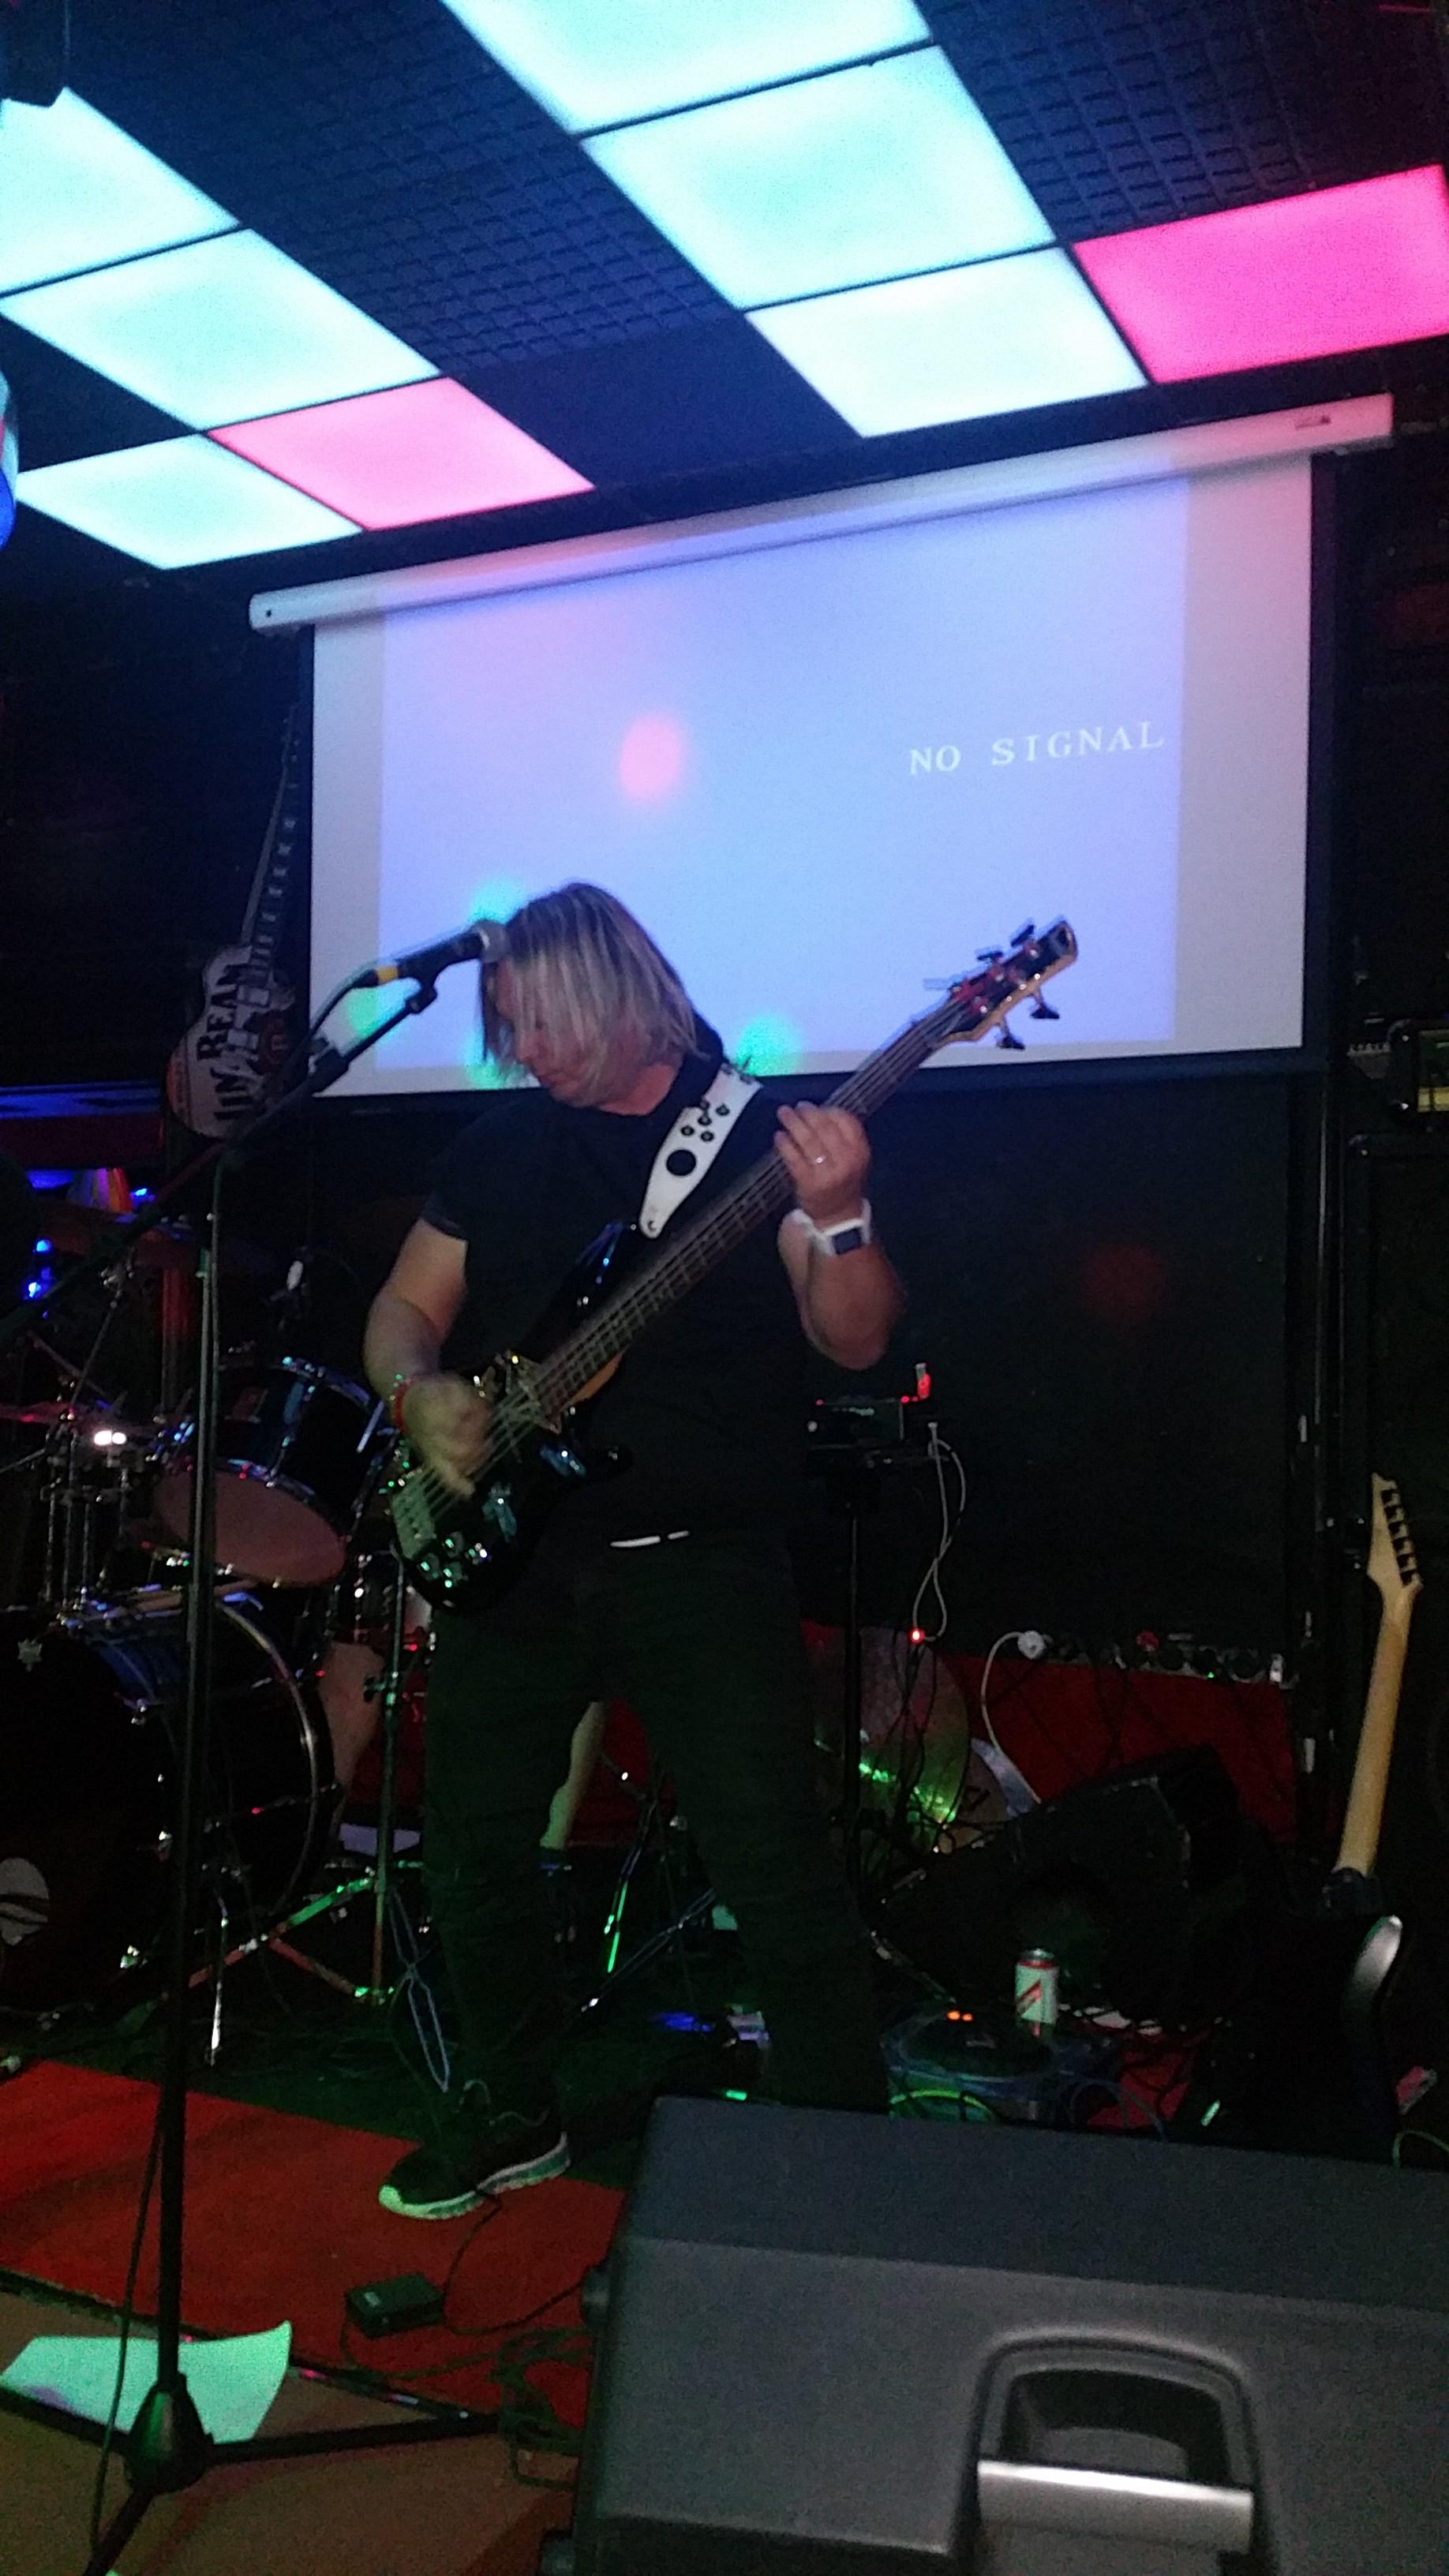 Live@Retribution Alive, The Lounge, London, UK - 21.4.2017